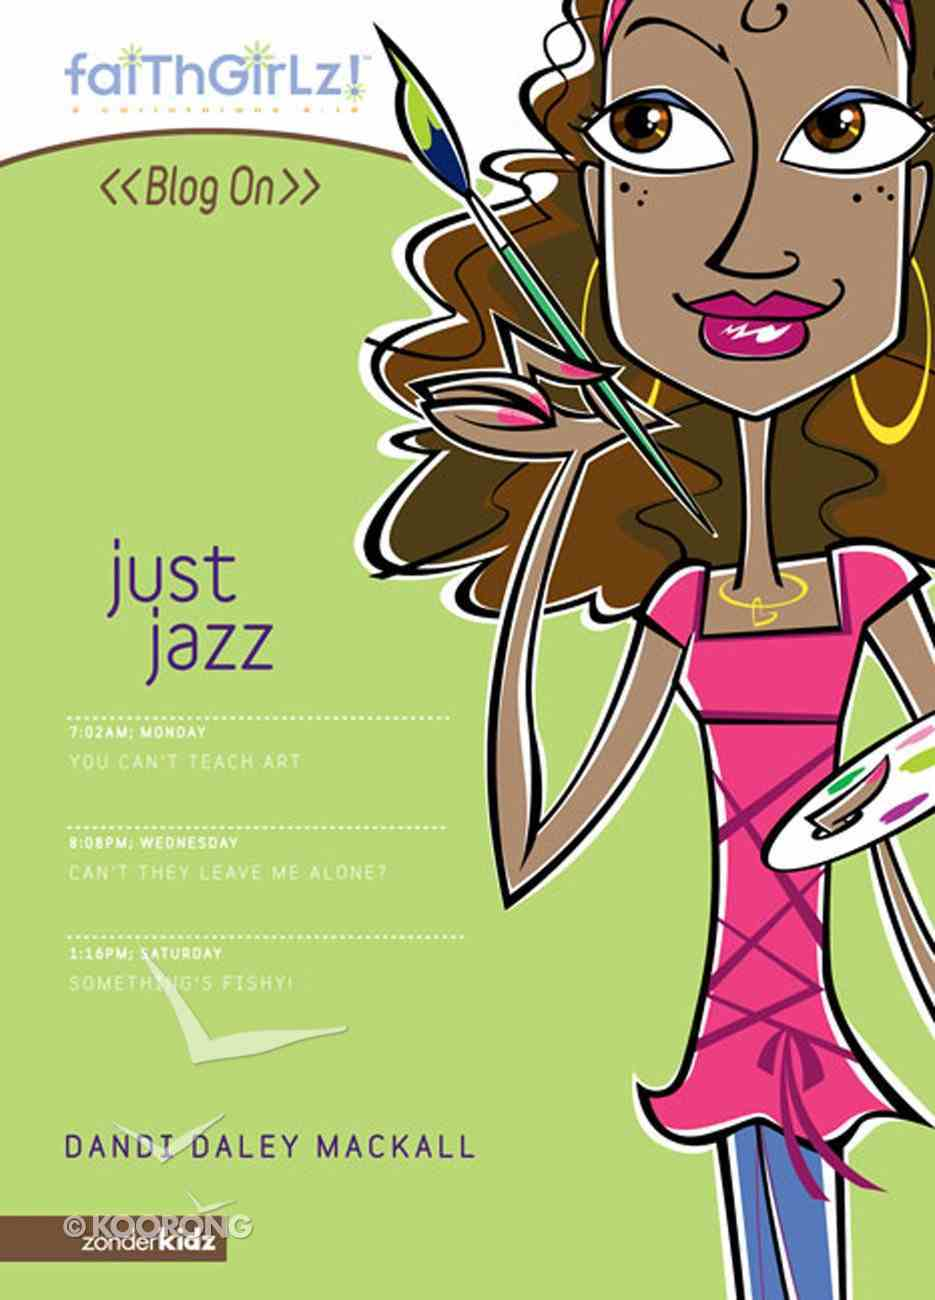 Faithgirlz Blog on #03: Just Jazz (#03 in Faithgirlz Blogon Series) eBook